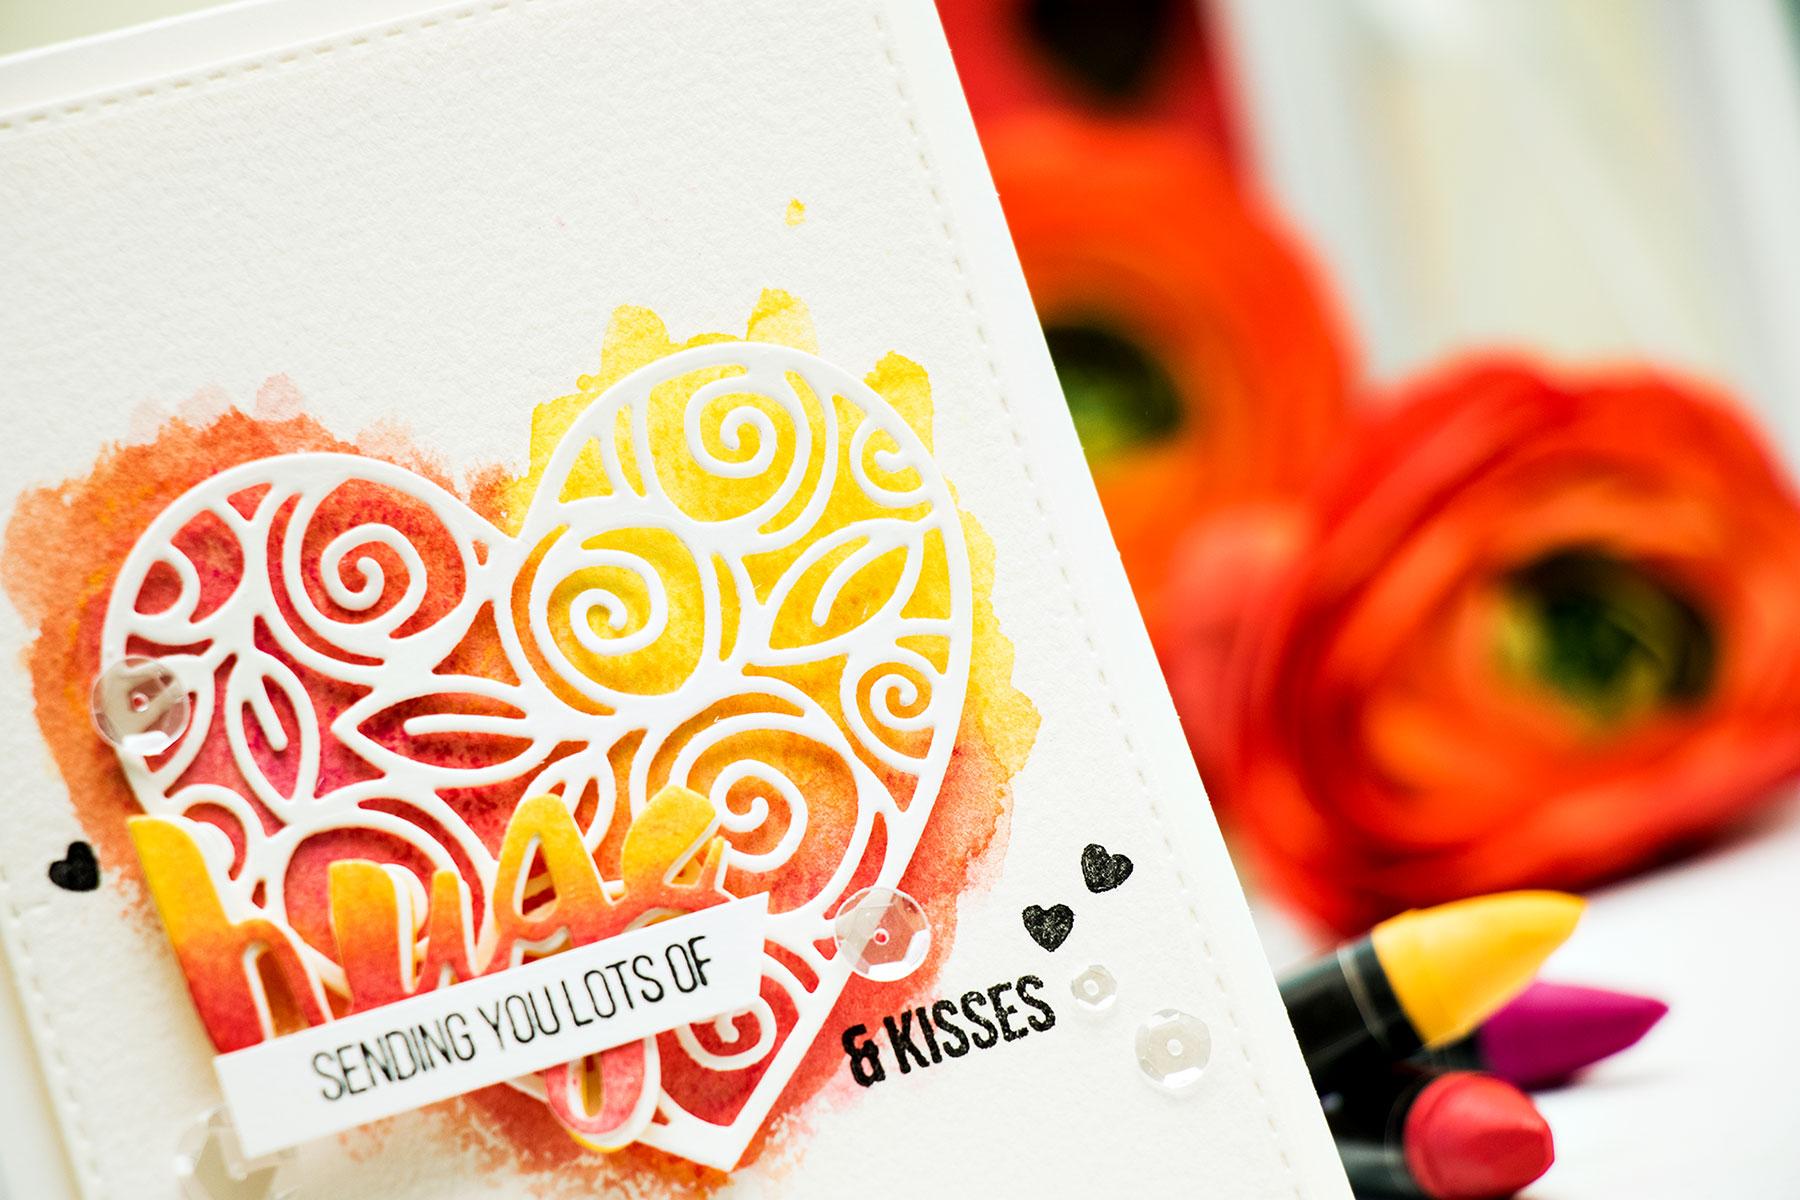 Simon Says Stamp | DieCember! Sending You Hugs & Kisses. Video